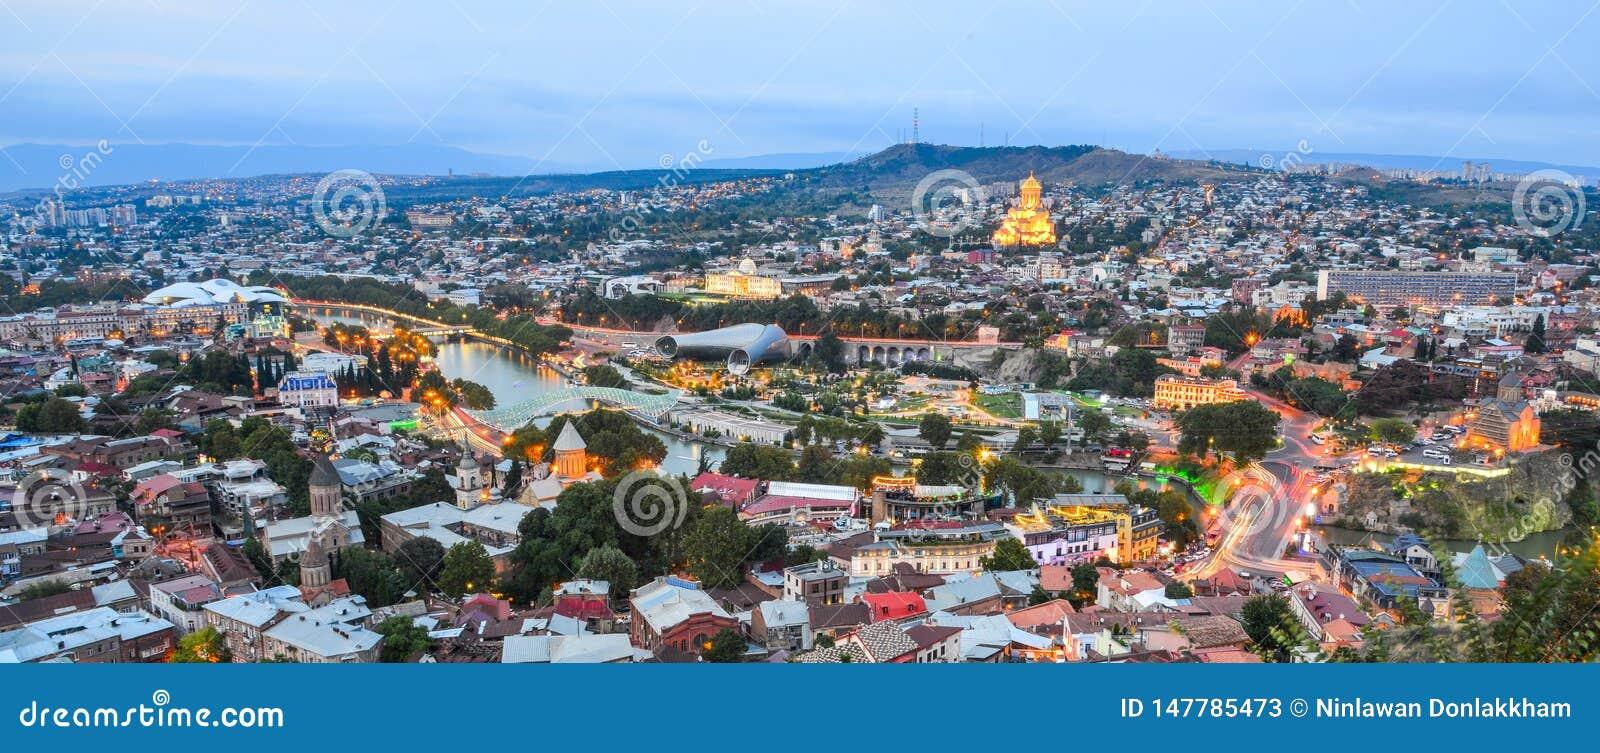 Noc widok Tbilisi, Gruzja